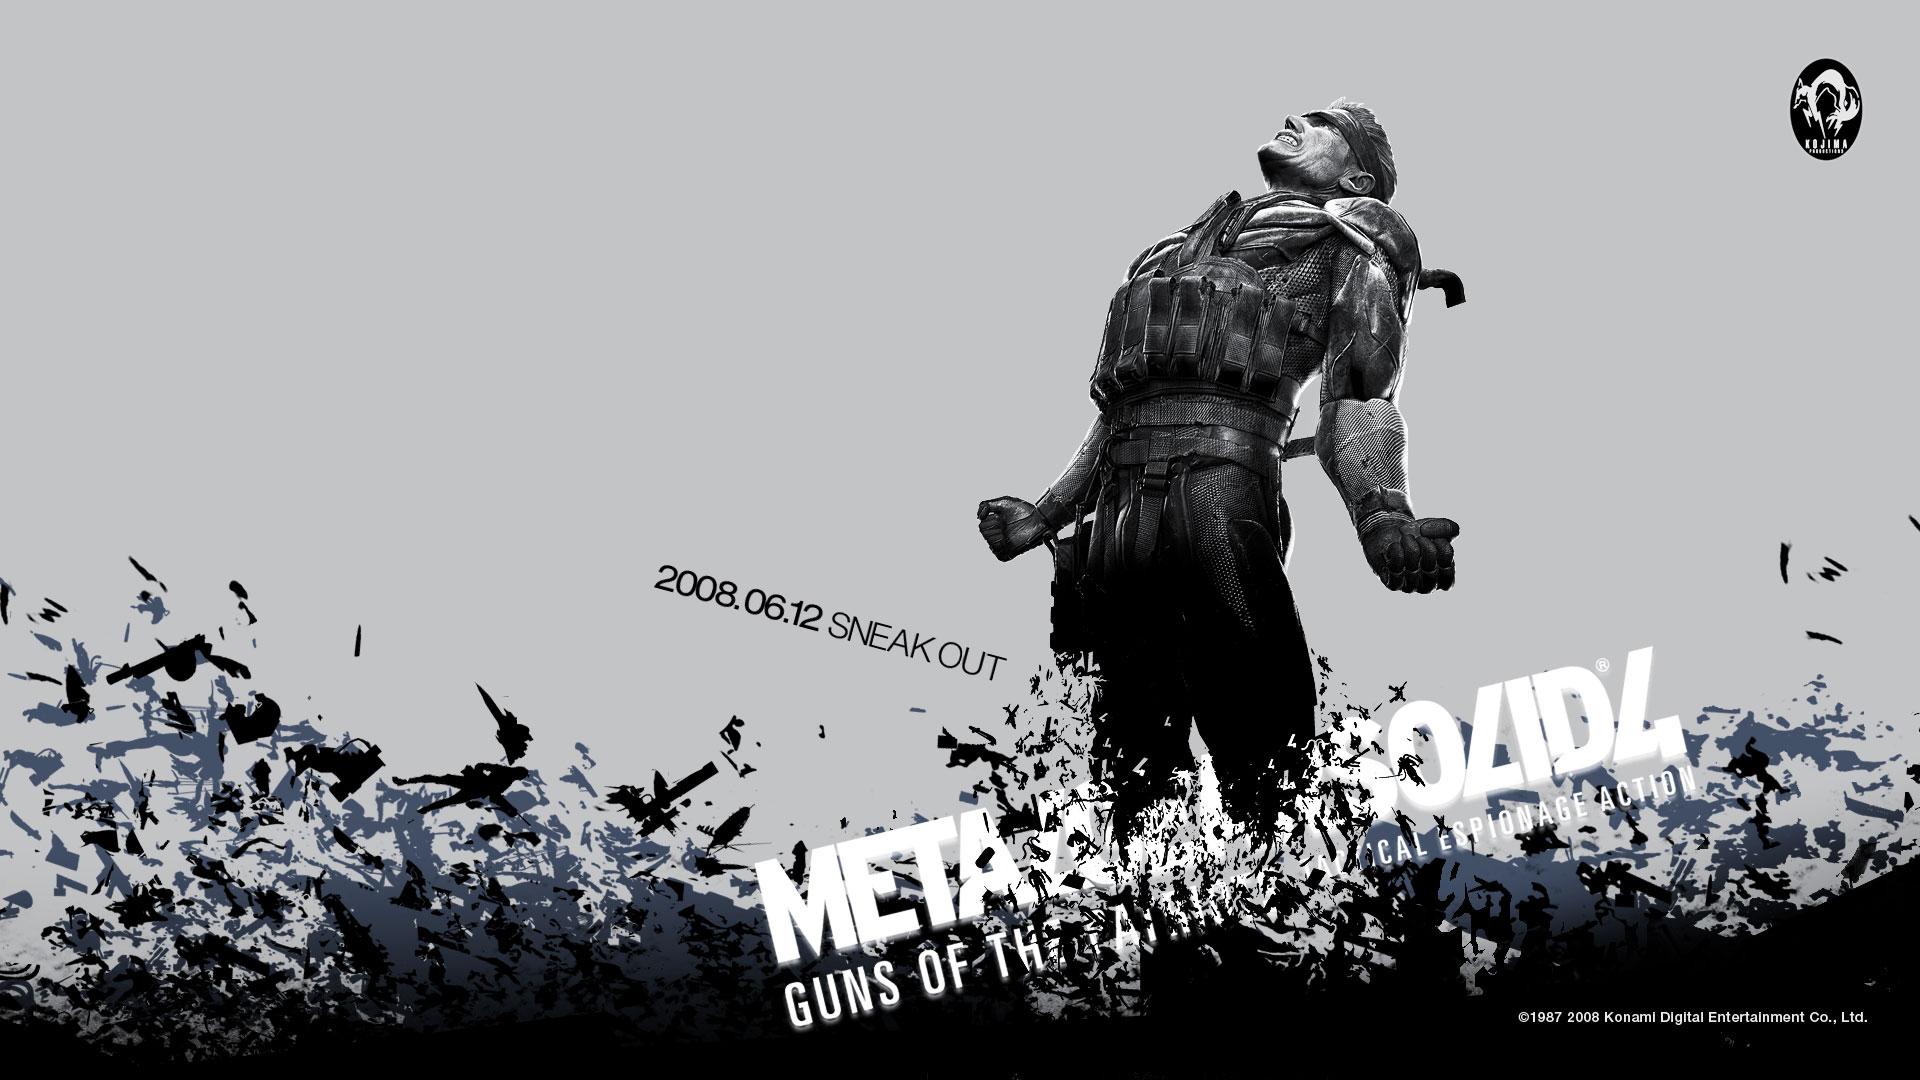 Metal Gear Solid 2 Wallpaper: Metal Gear Solid 3 Wallpaper